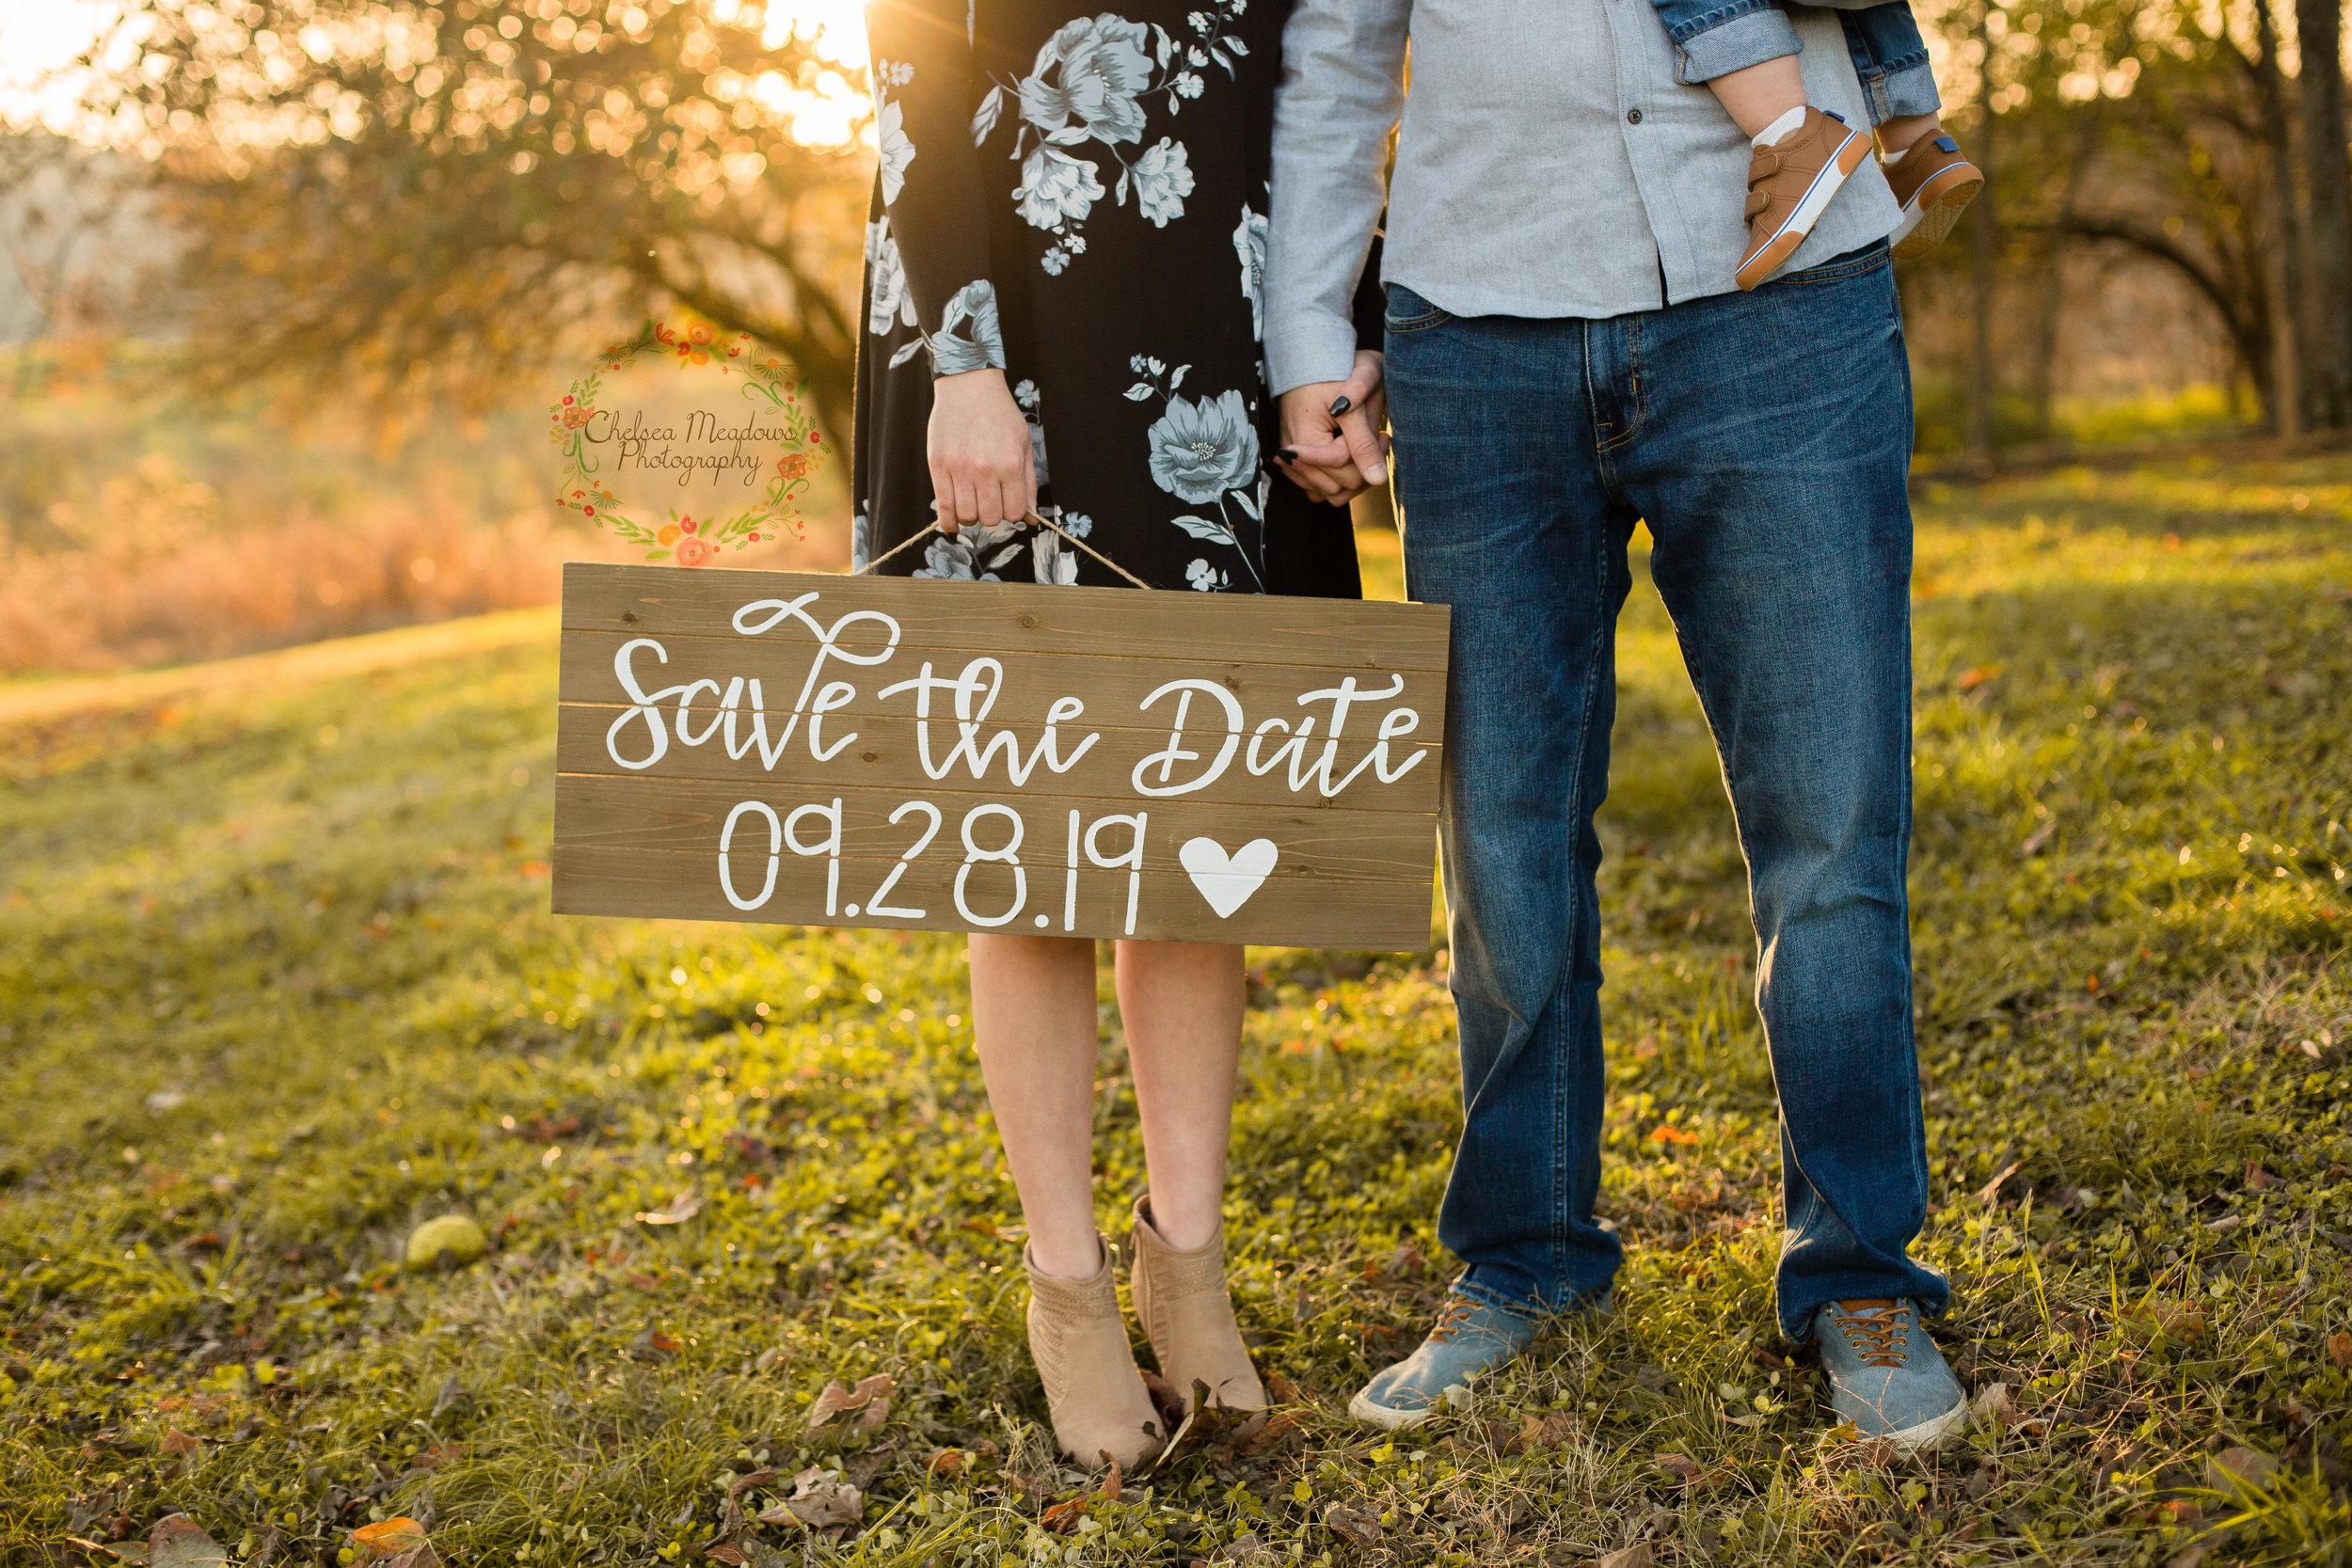 Jessica & Derek Engagement - Nashville Wedding Photographer - Chelsea Meadows Photography (1).jpg